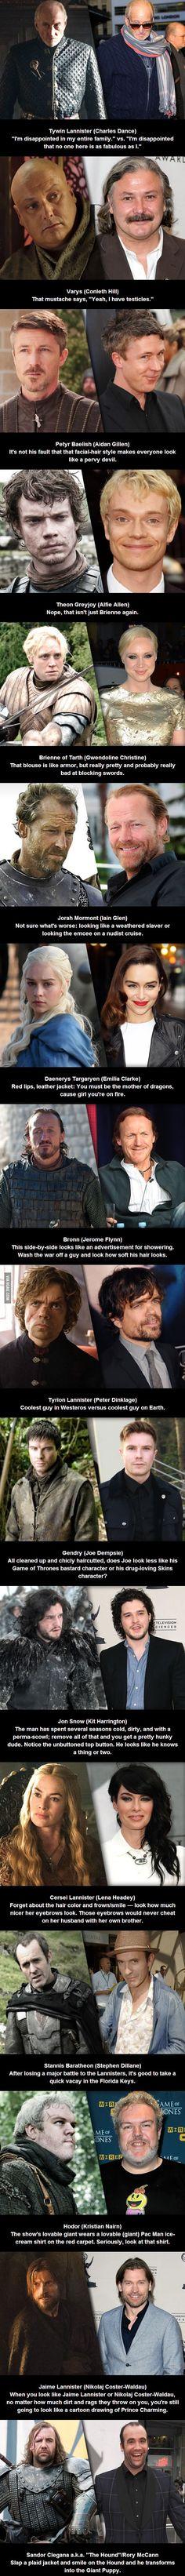 Game of Thrones: Actors vs Characters